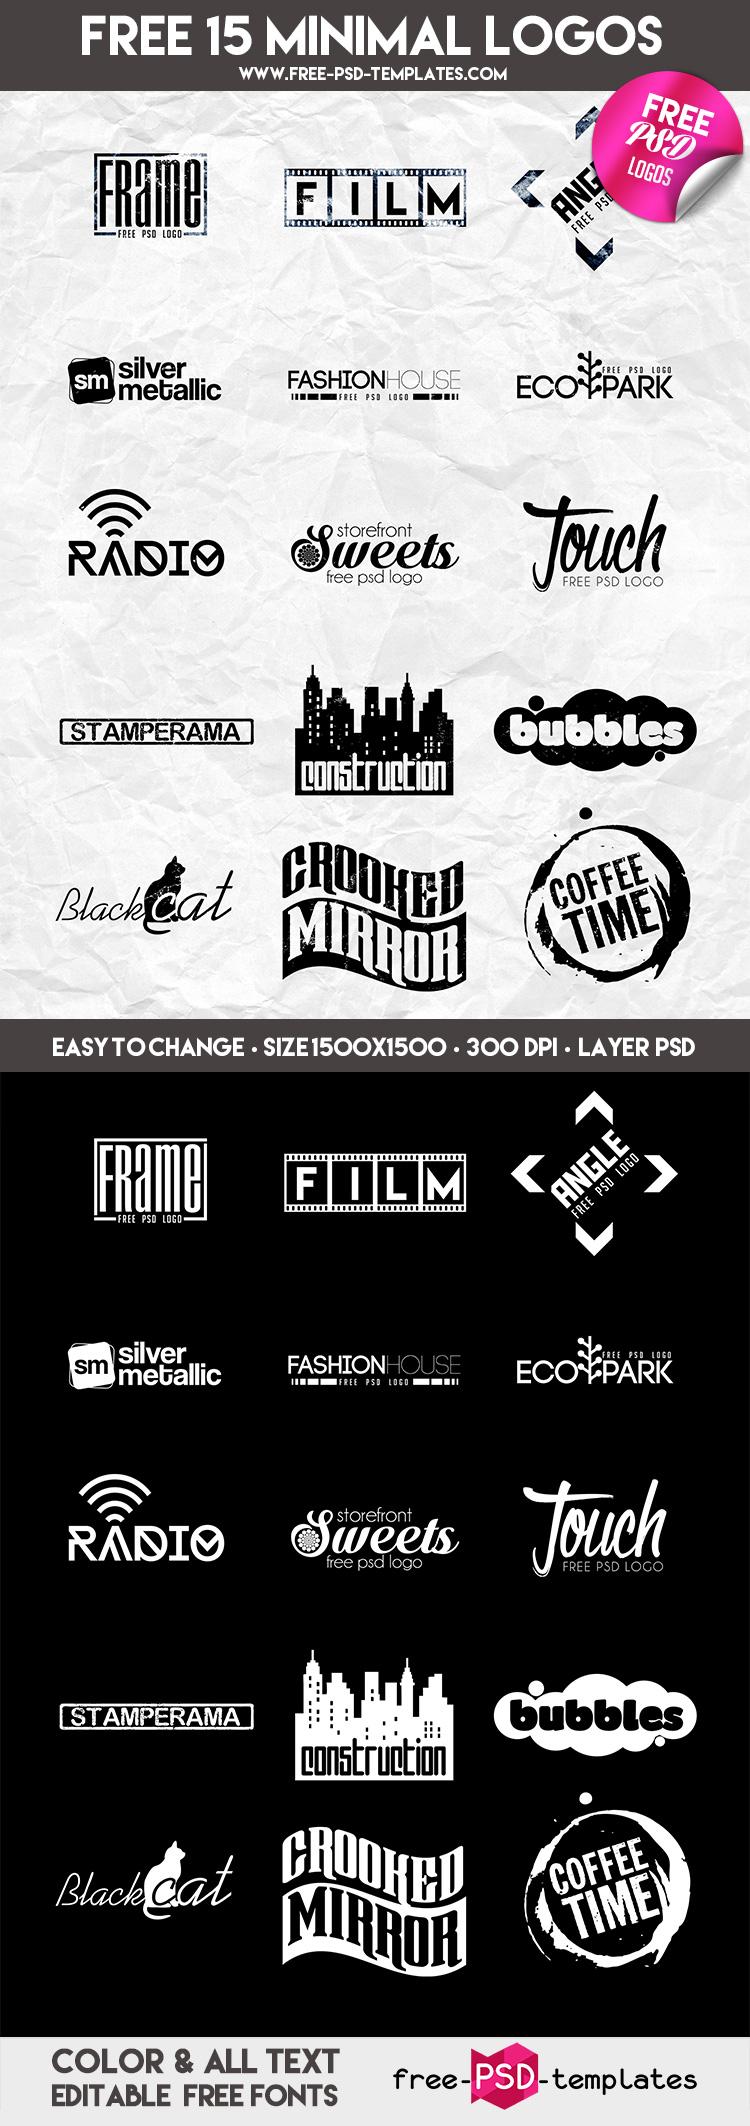 Preview_Free_15_Minimal_Logos